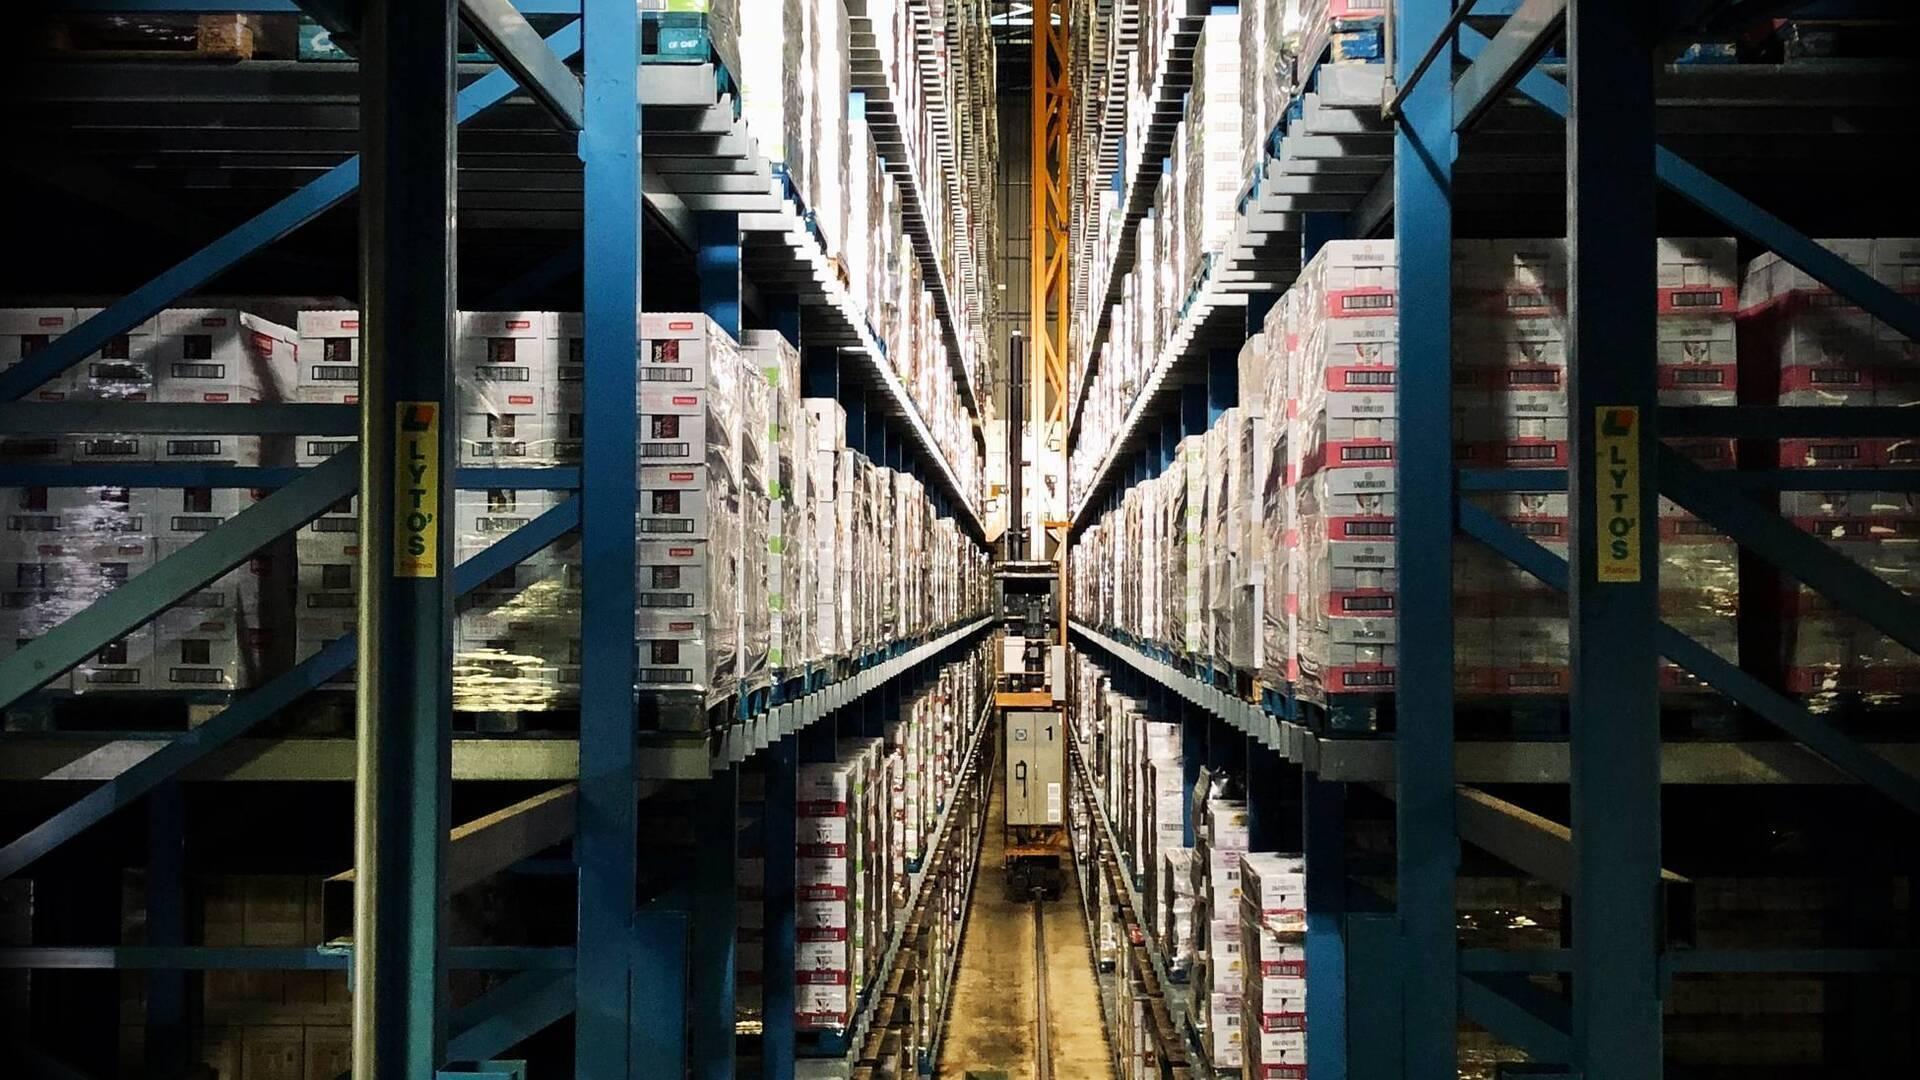 Warehouse racks that stretch for hundreds of feet